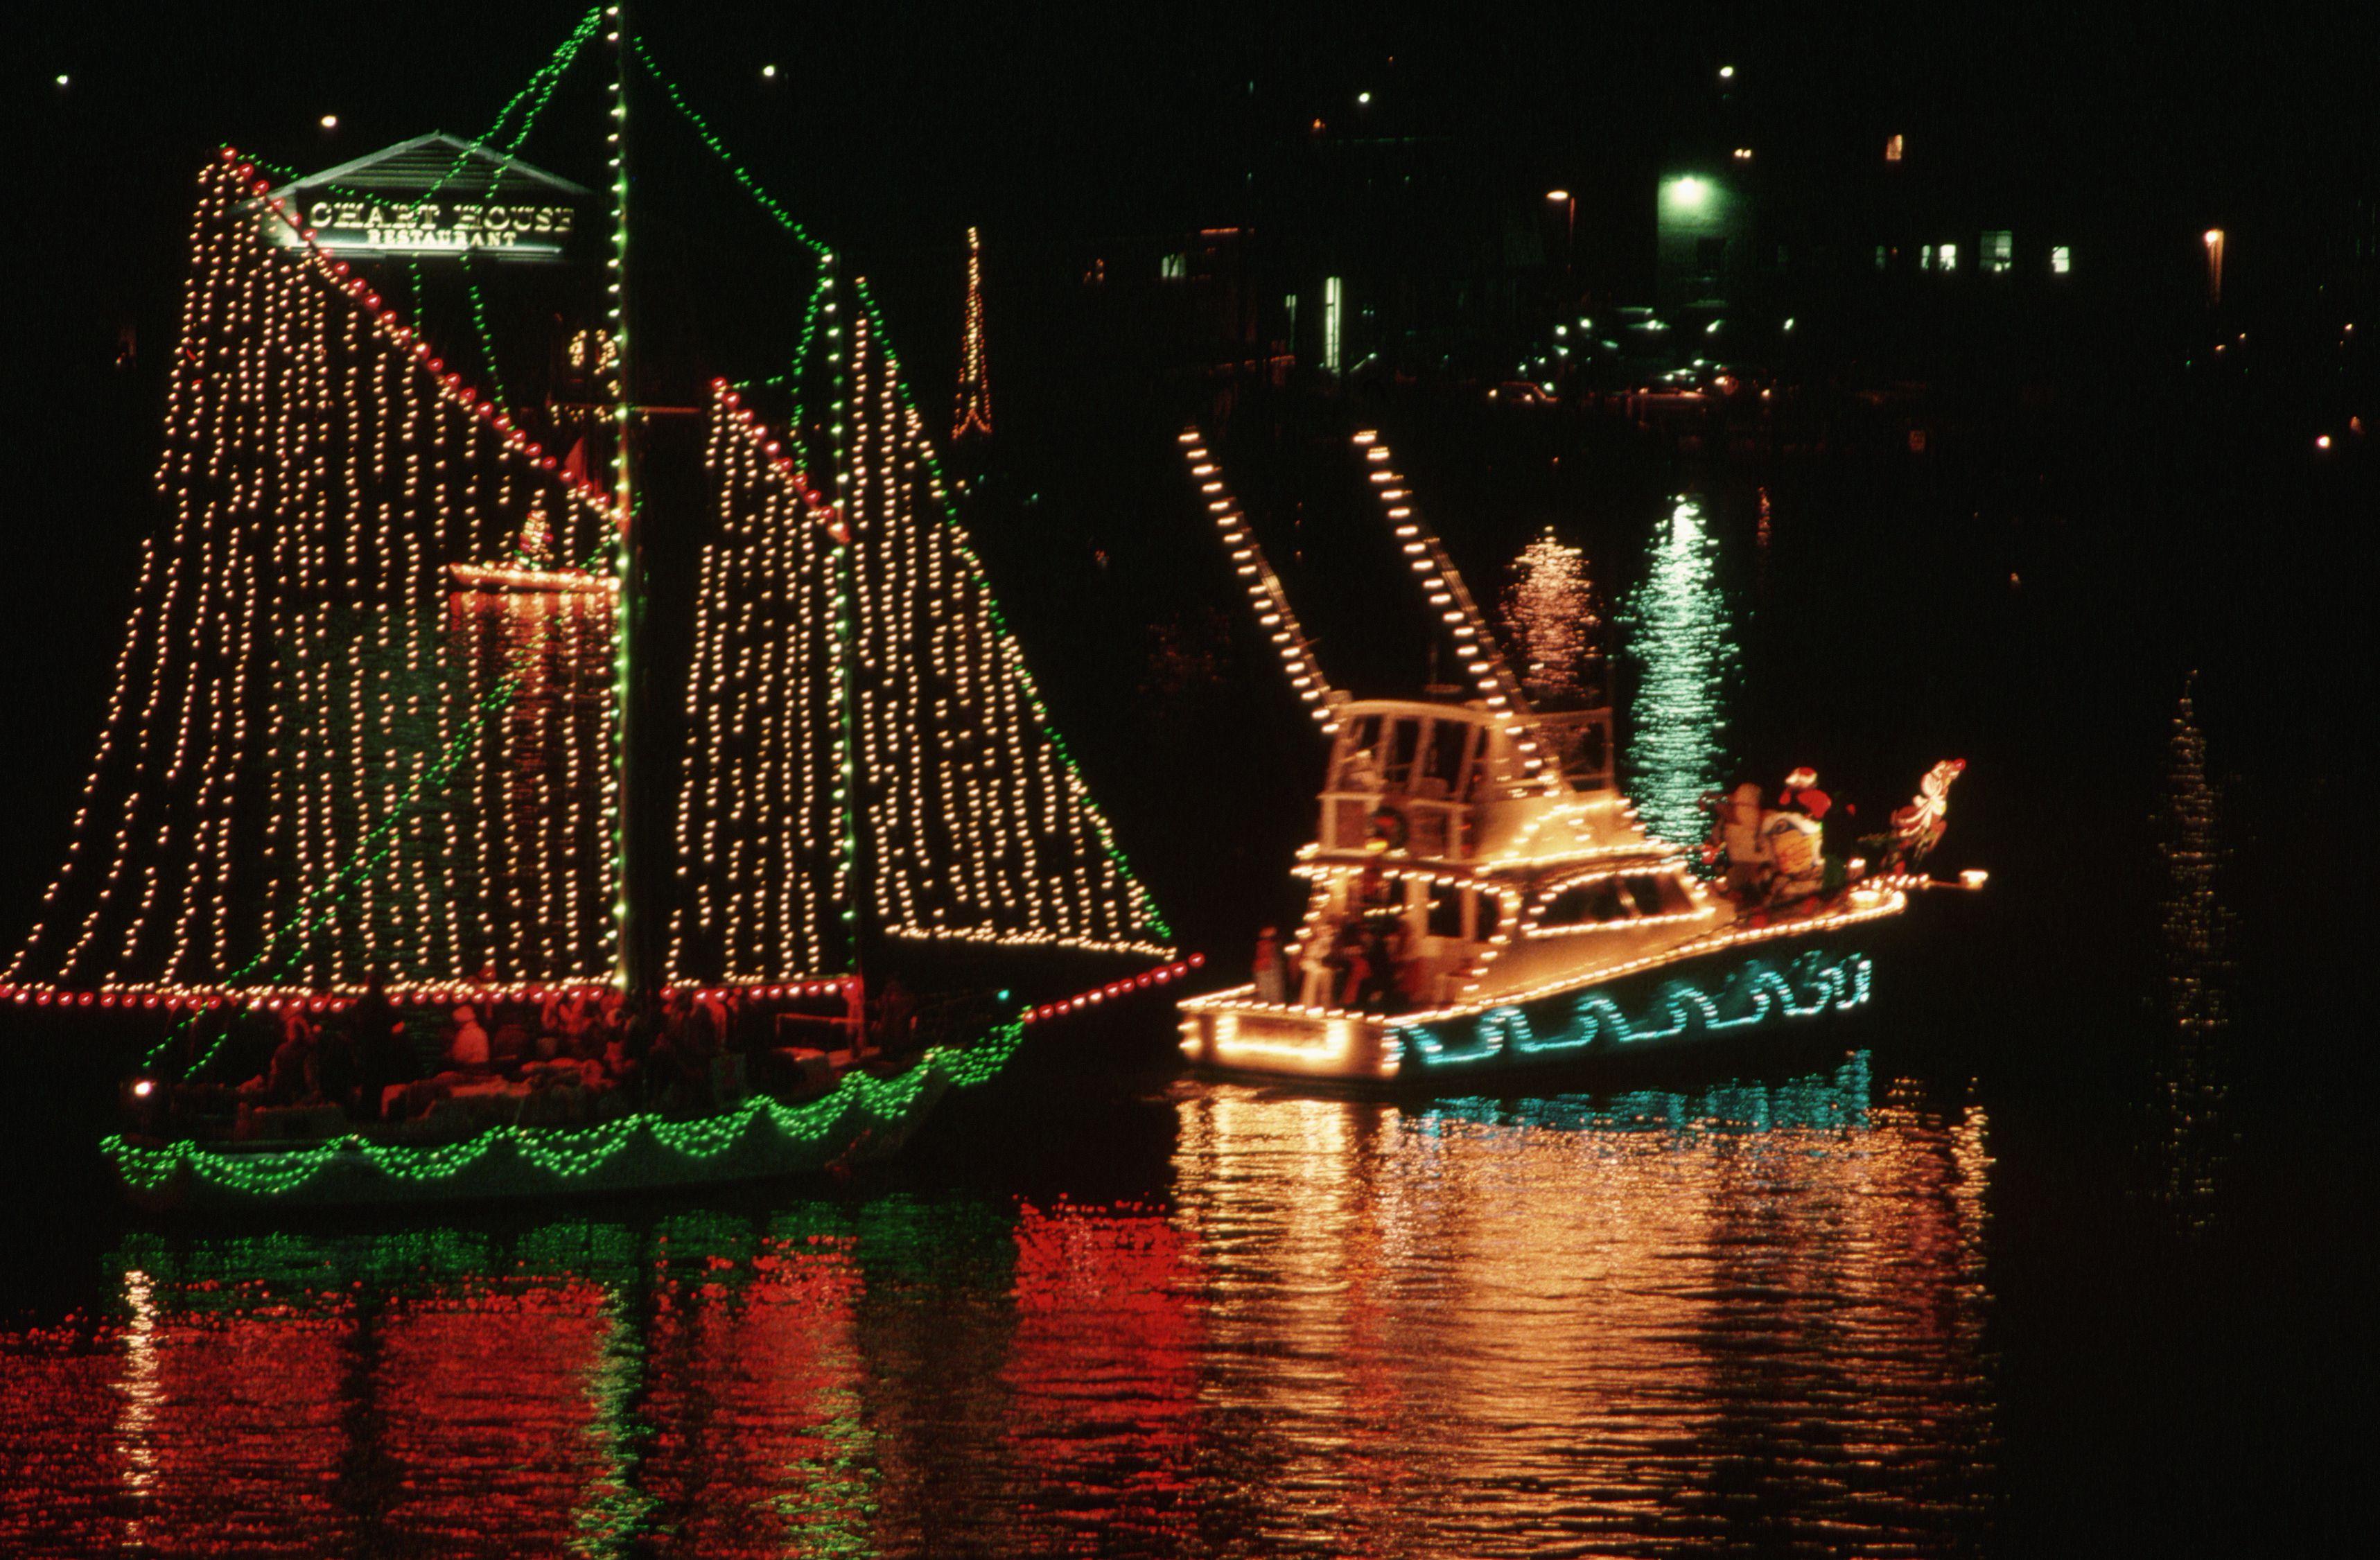 Alexandria Christmas Lights 2020 Alexandria and D.C. Holiday Boat Parade of Lights 2020